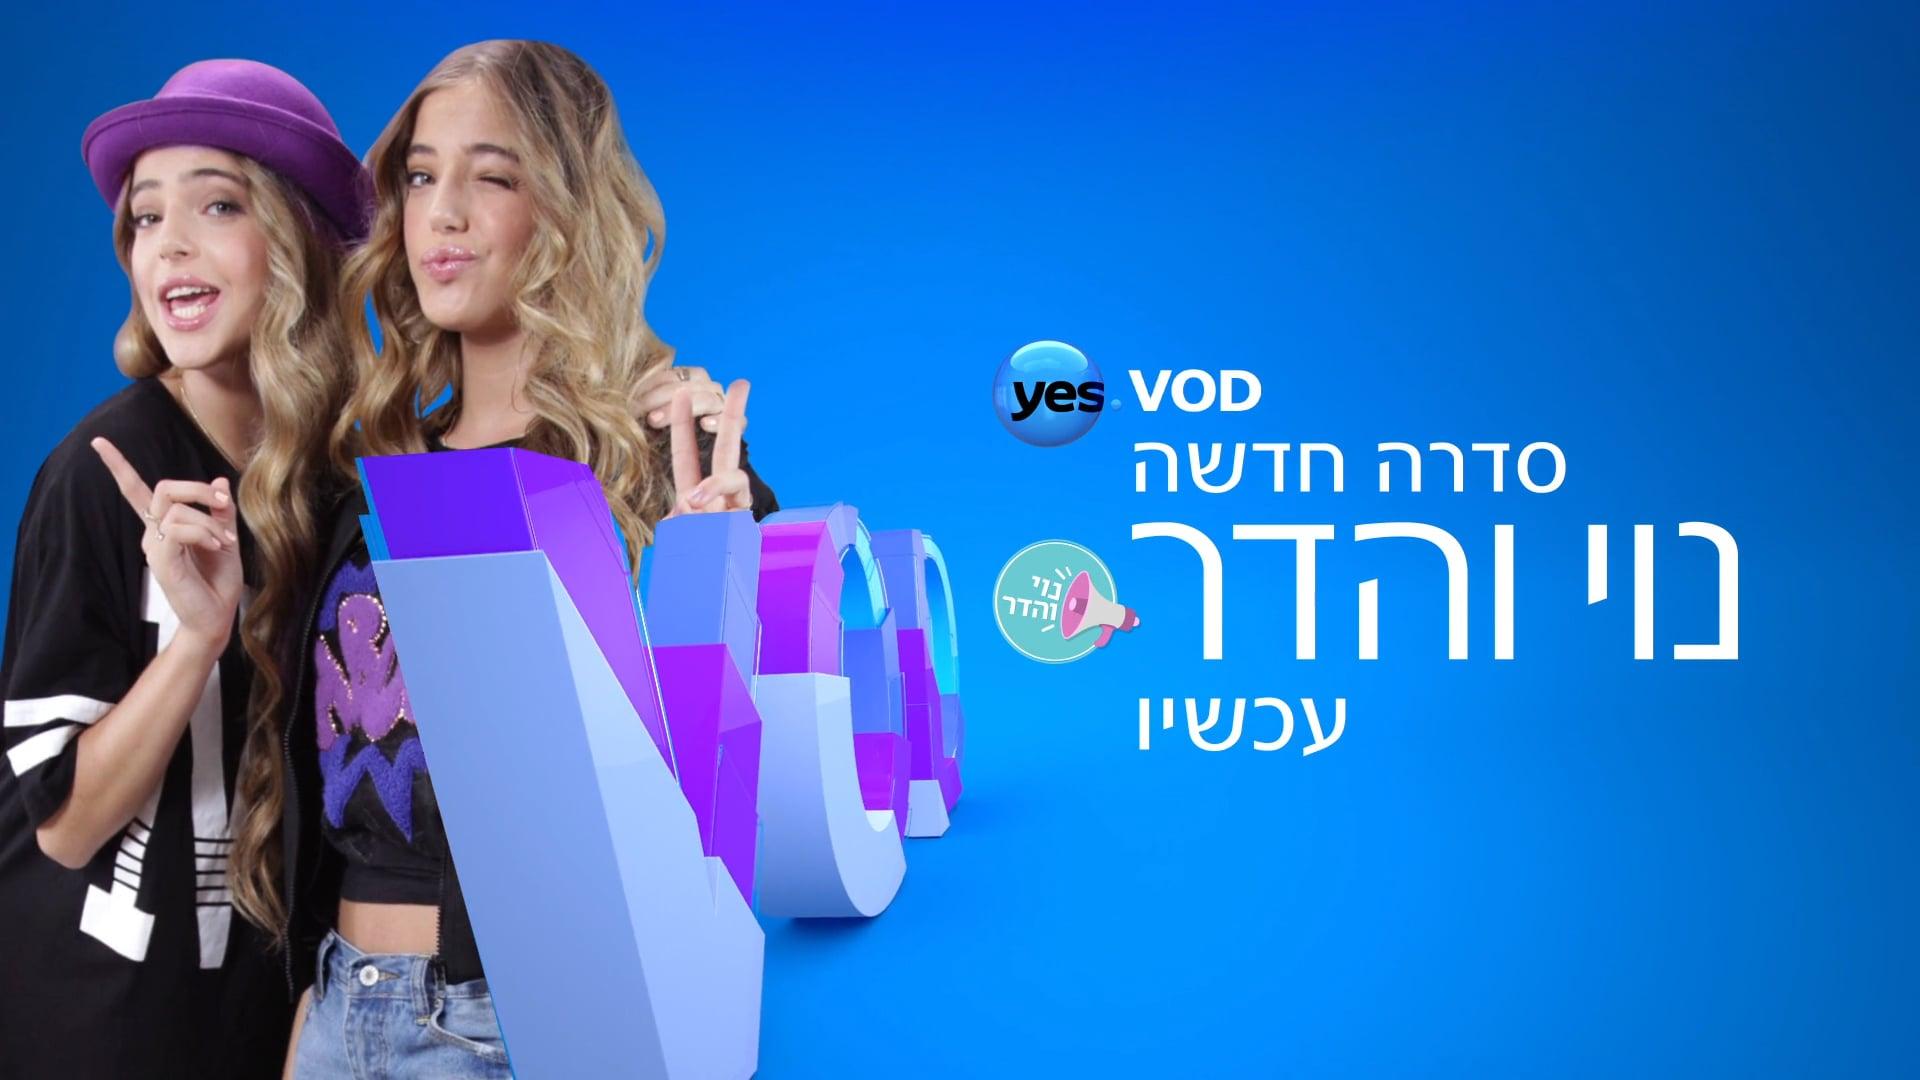 Noy & Hadar TV show for yesVOD PROMO נוי והדר עונה 1